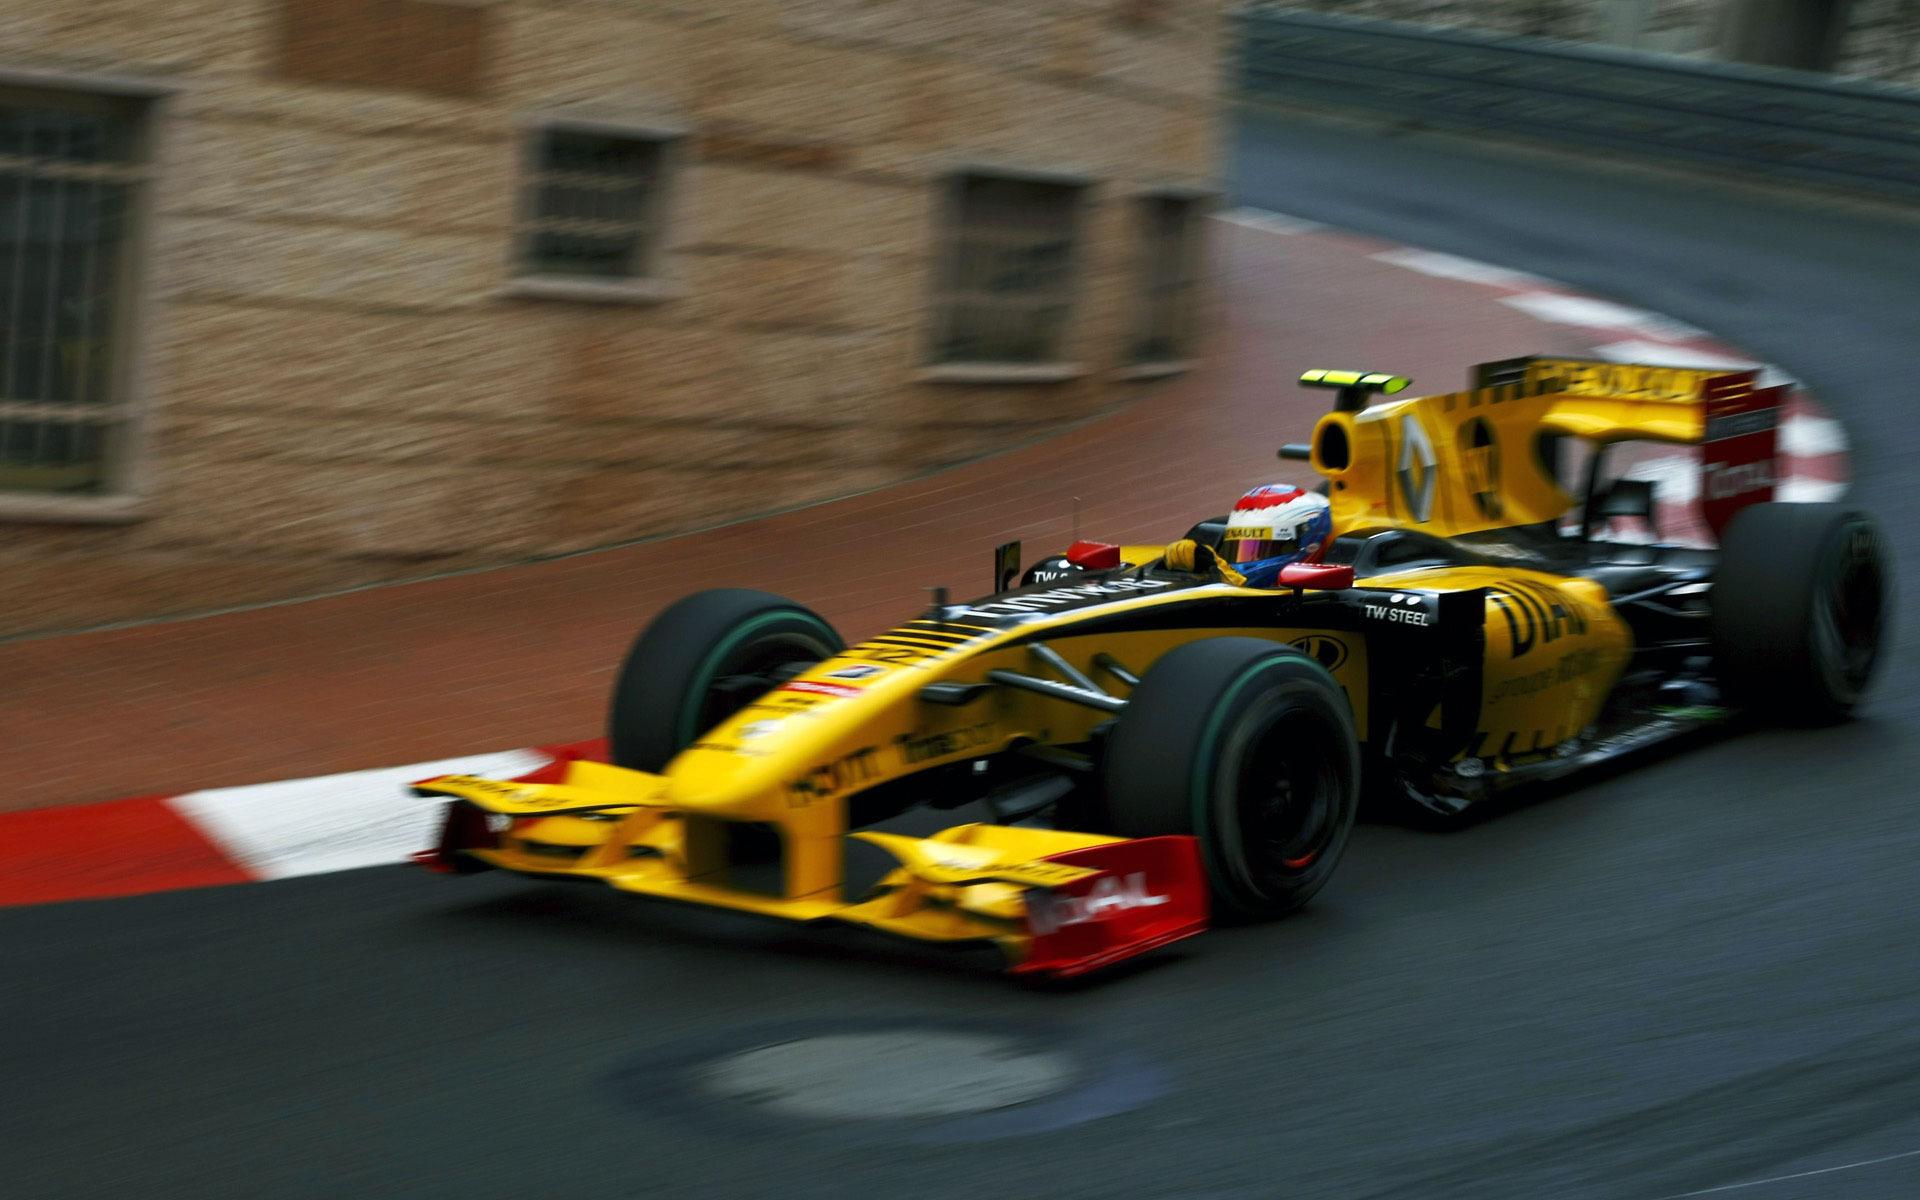 Vitaly Petrov, Renault F1 2010 GP Mónaco